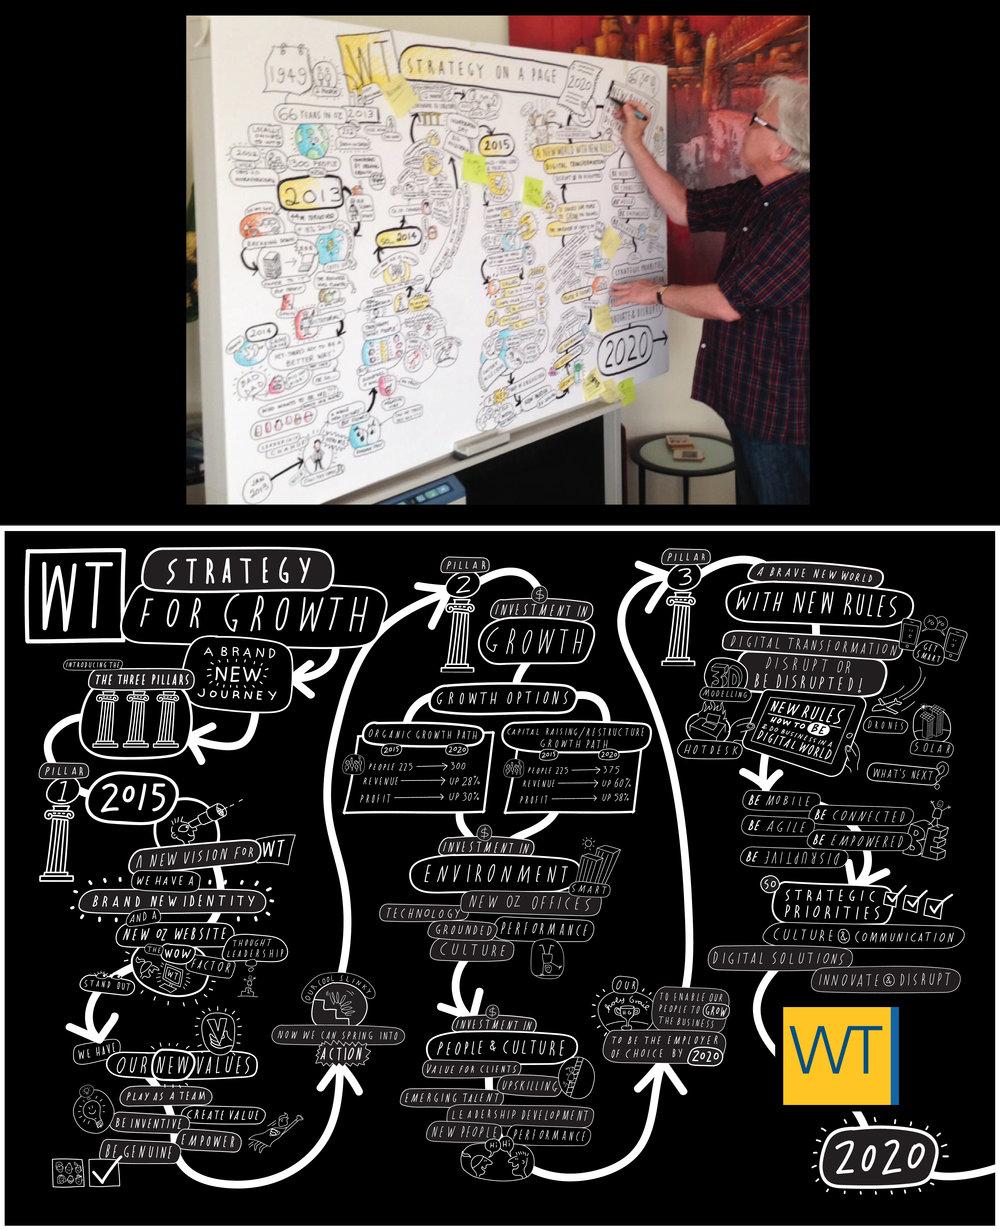 WT_site-01.jpg